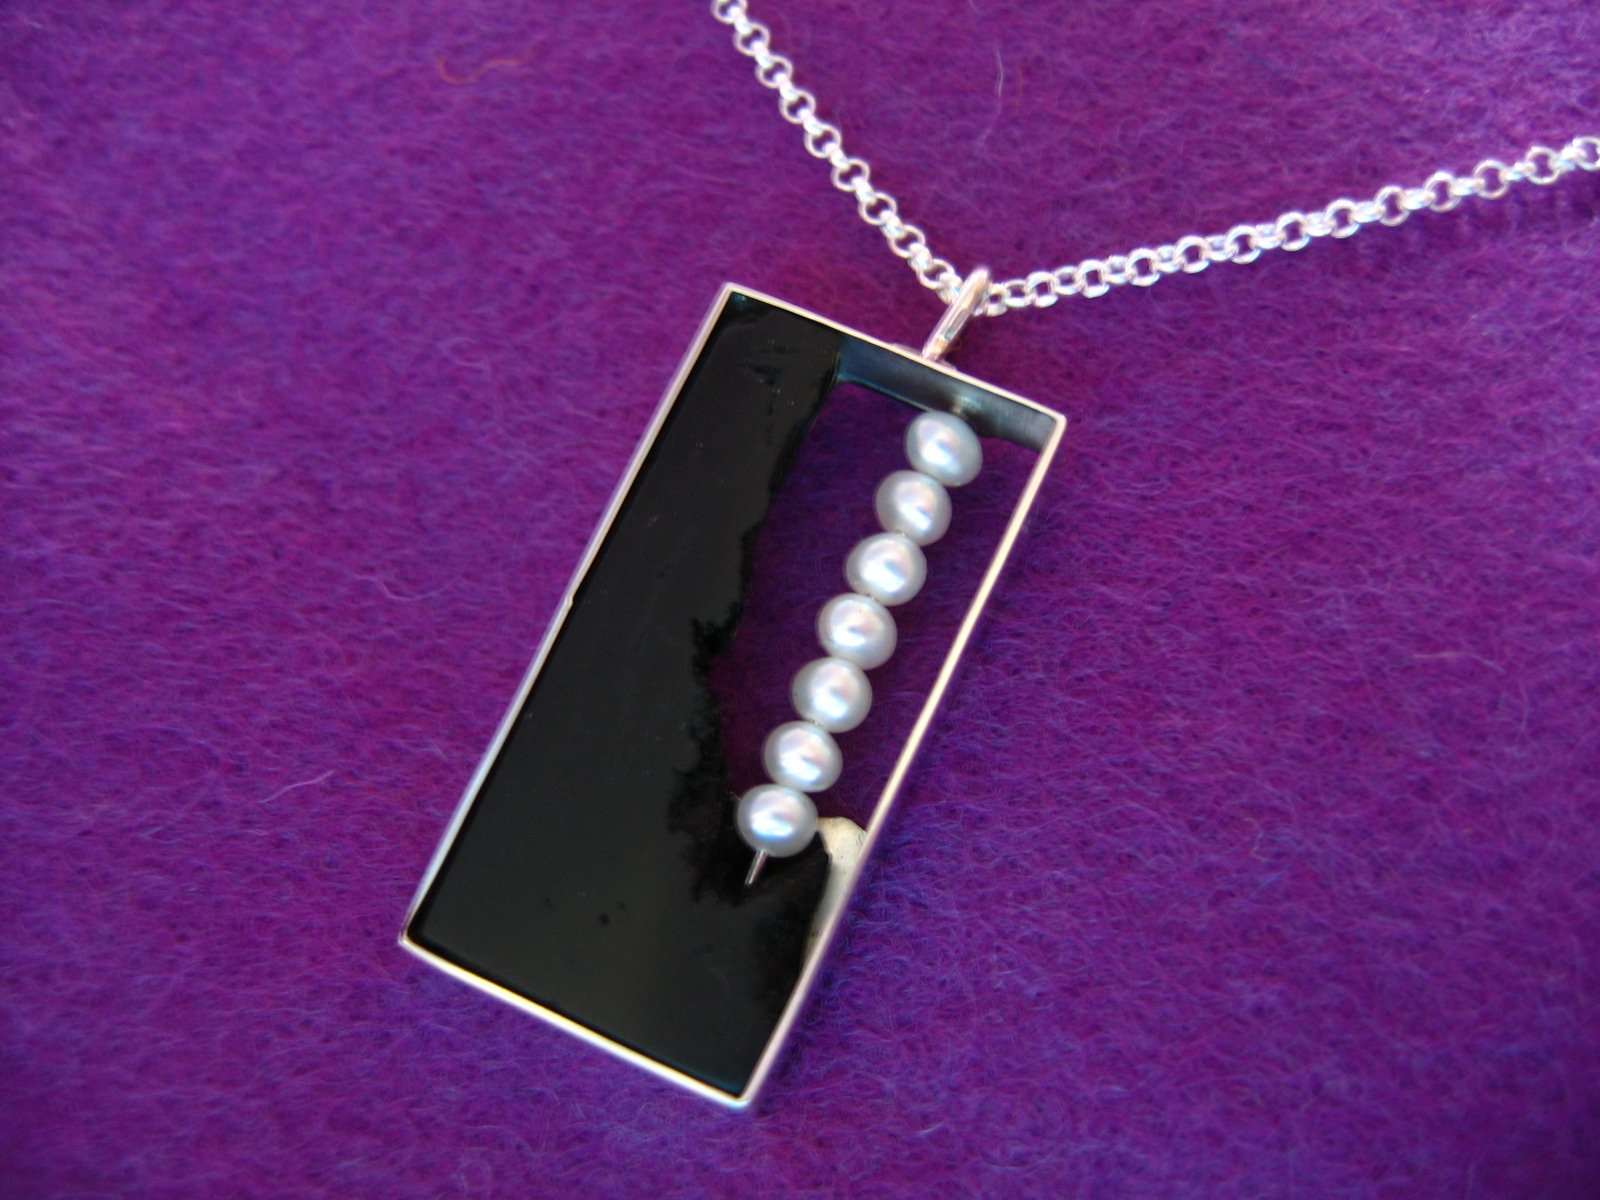 zilver, ebbenhout en parels - 2009